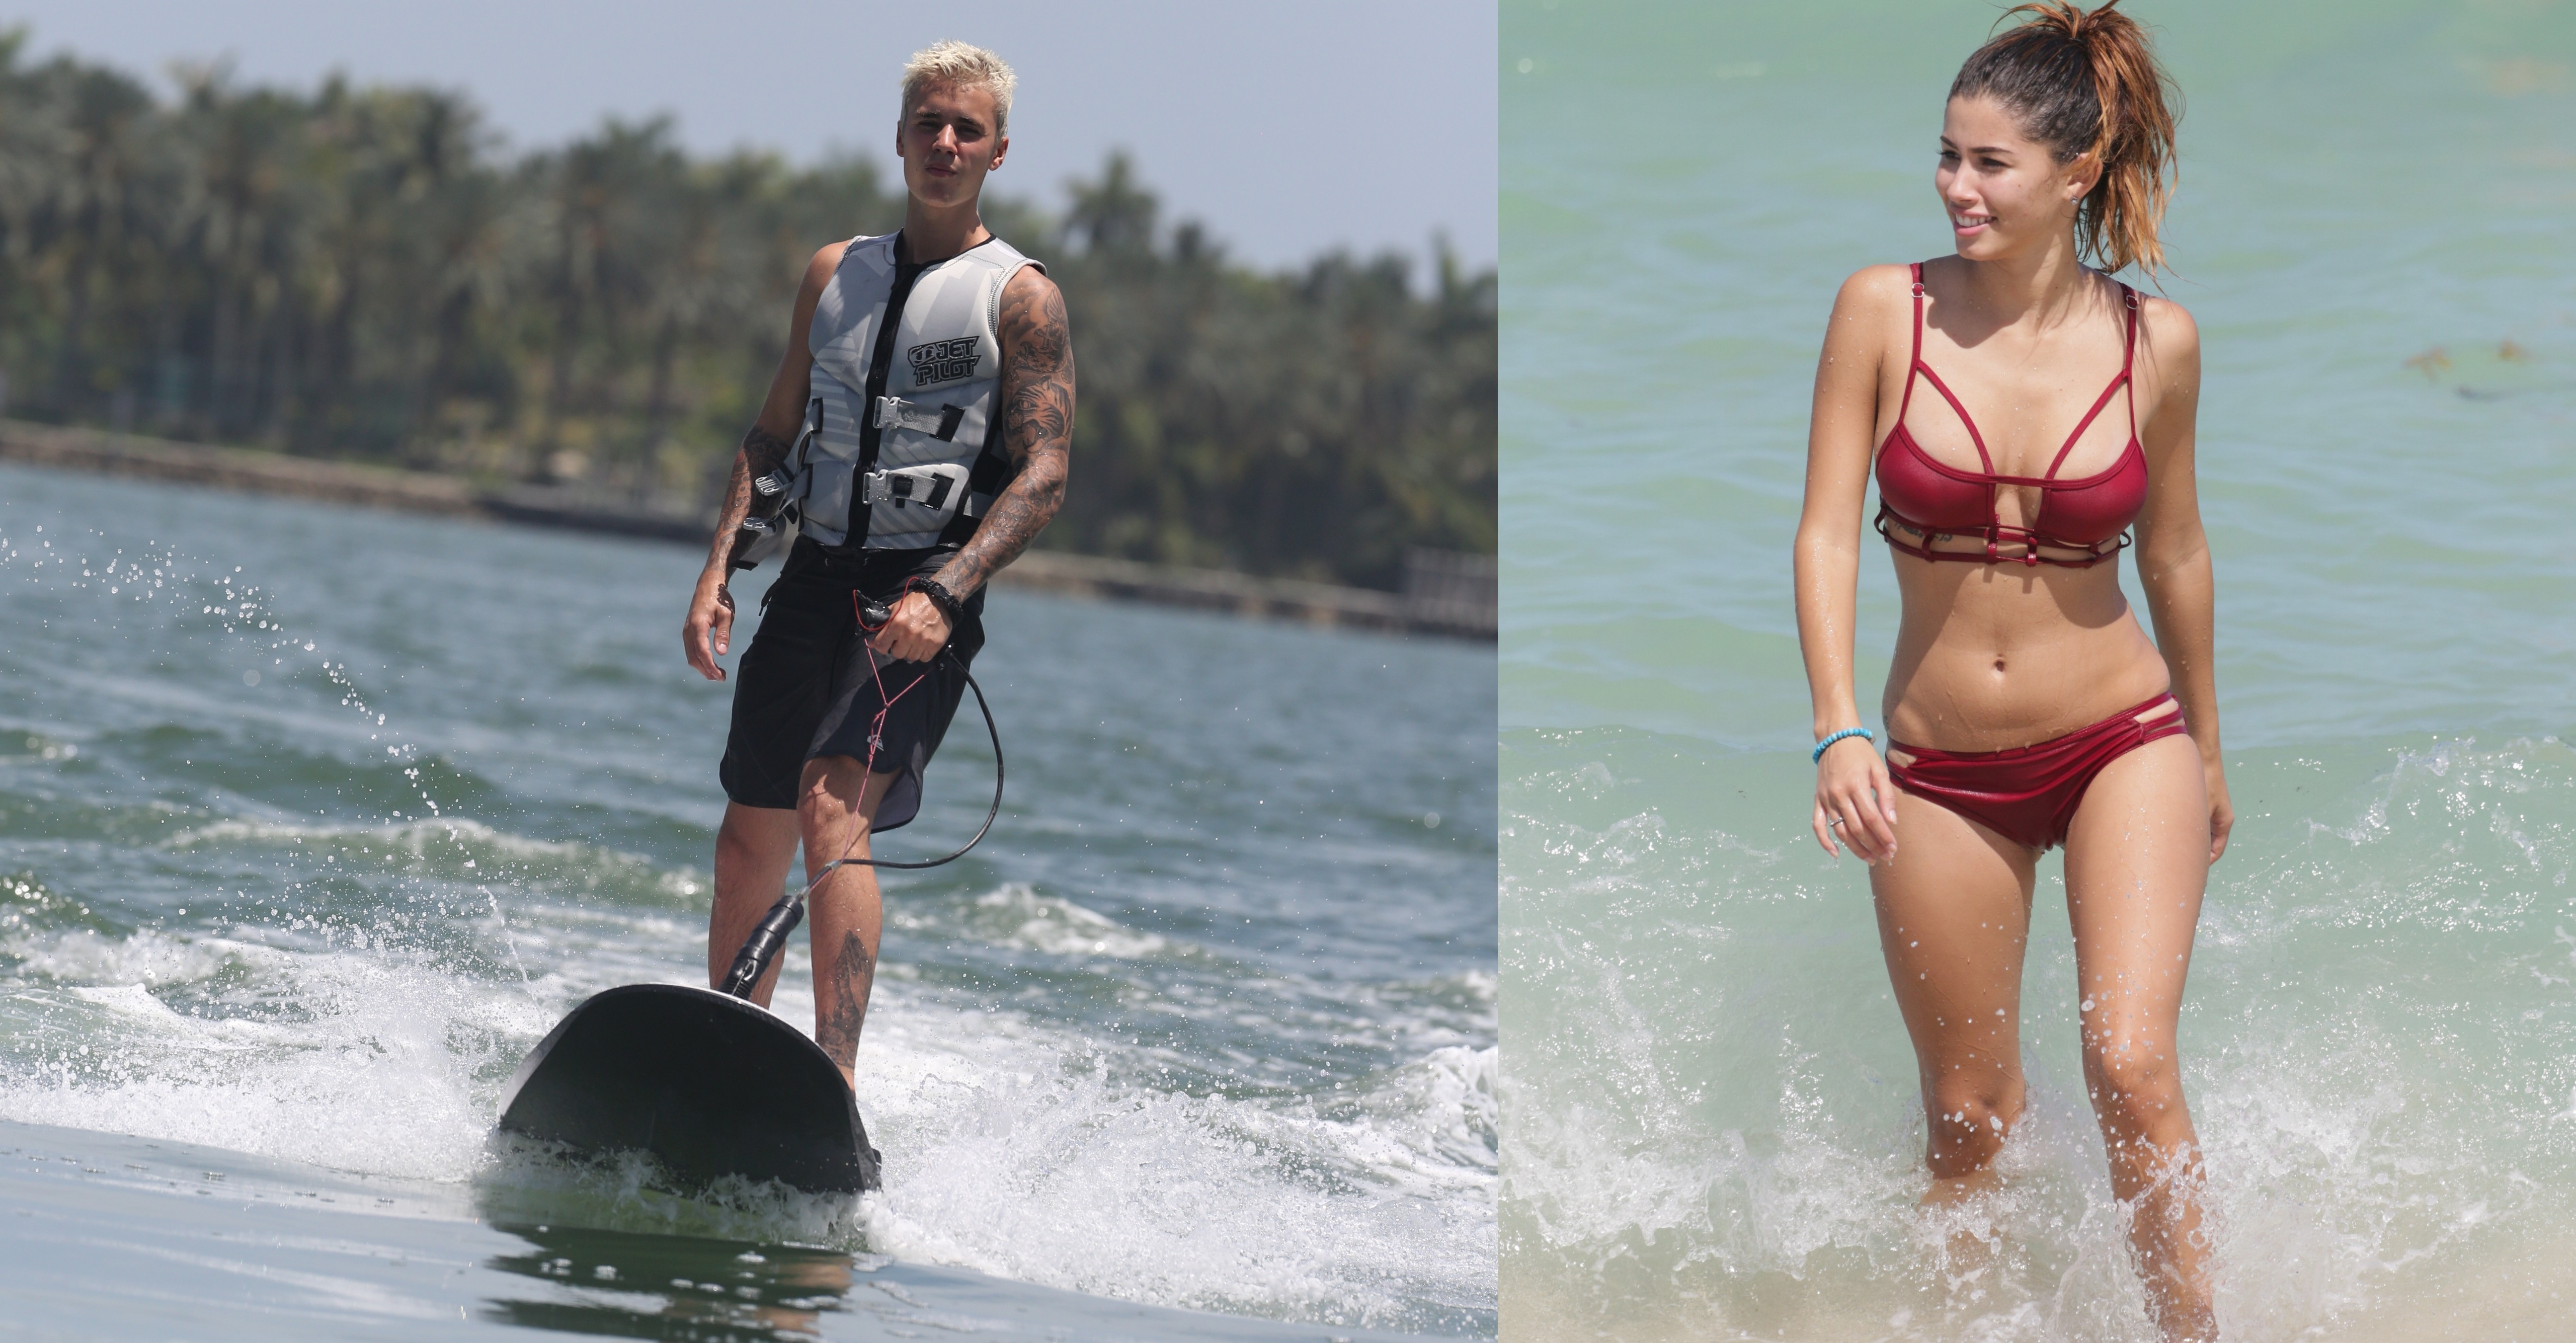 Justin Bieber goes wakeboarding with Selena Gomez lookalike